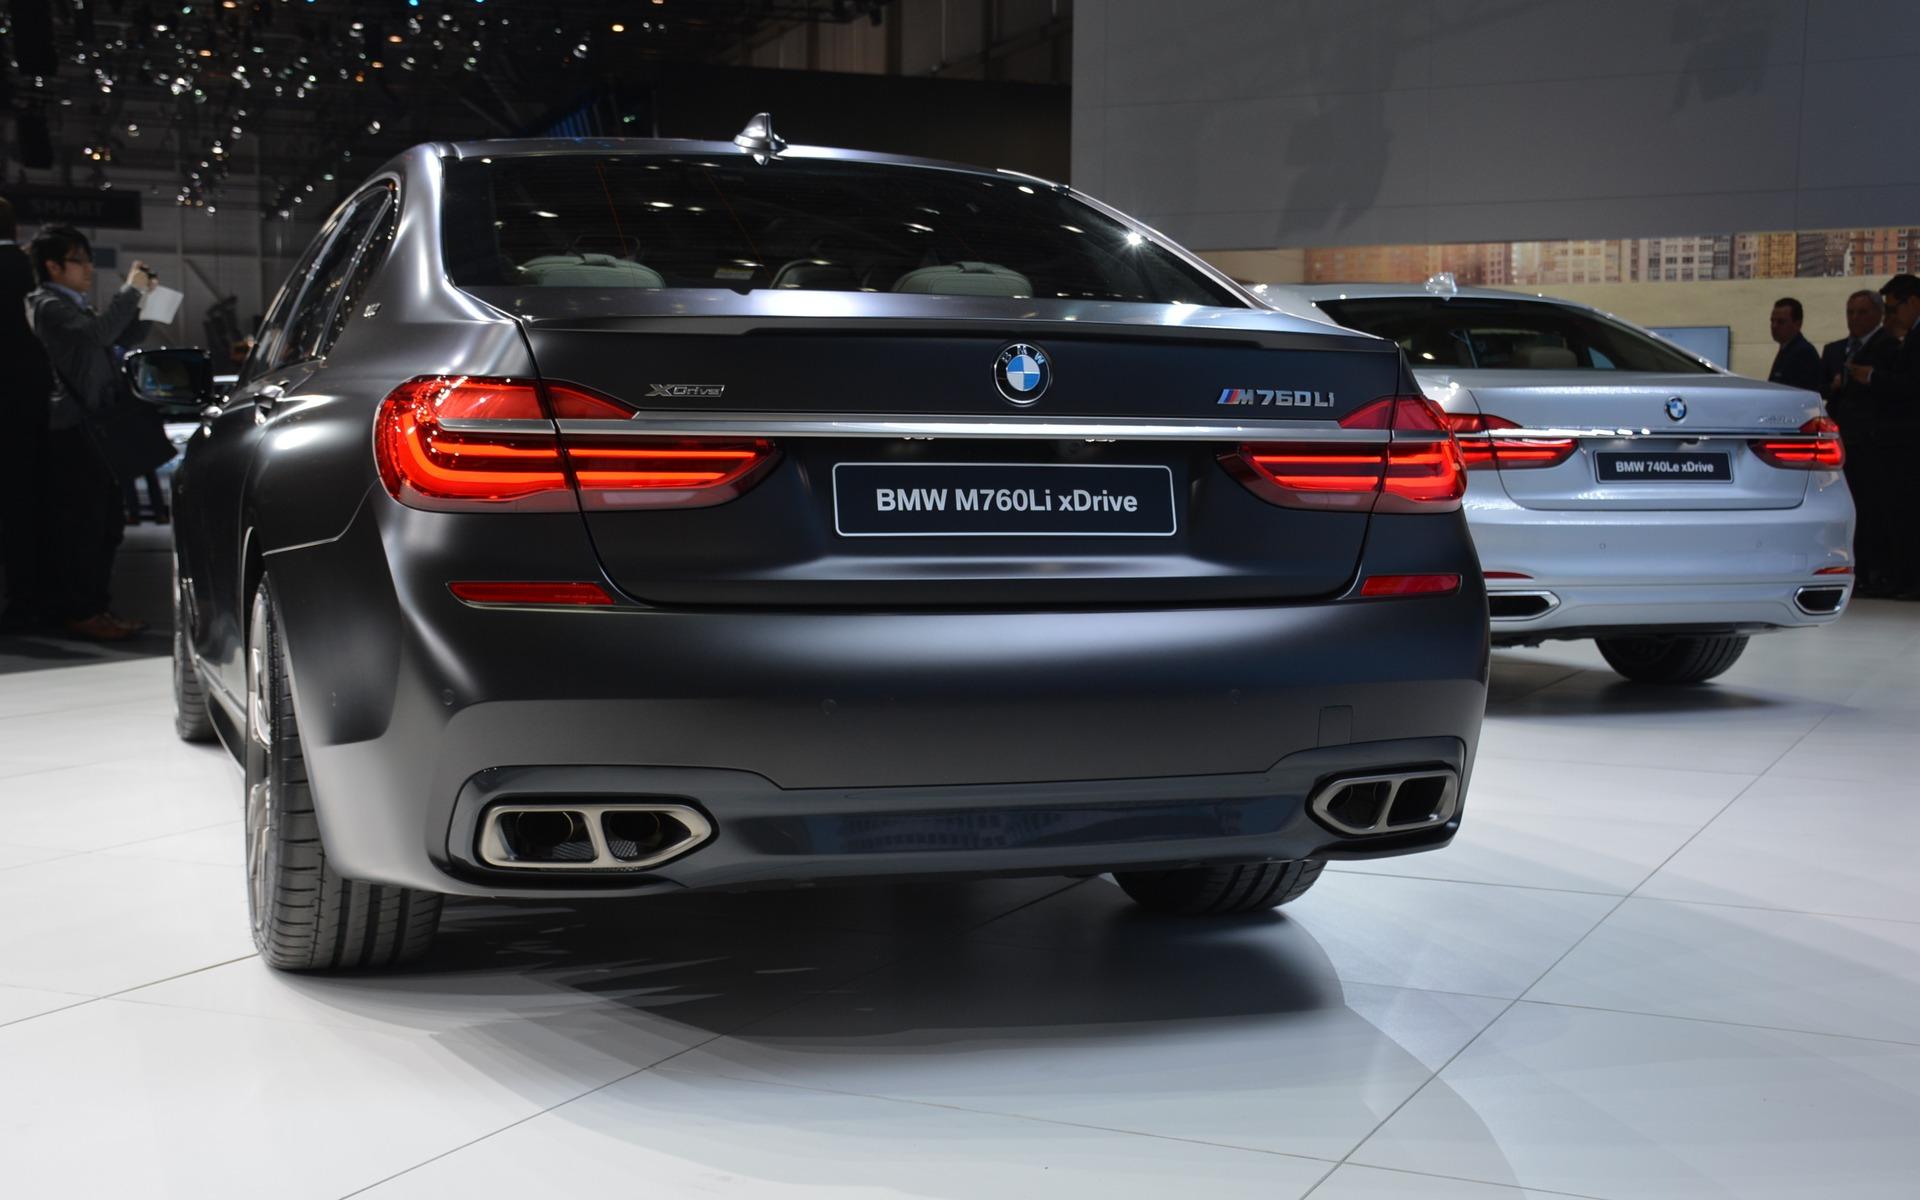 Bmw 6 Series Reviews >> Finally, an M Powered BMW 7 Series - 7/22